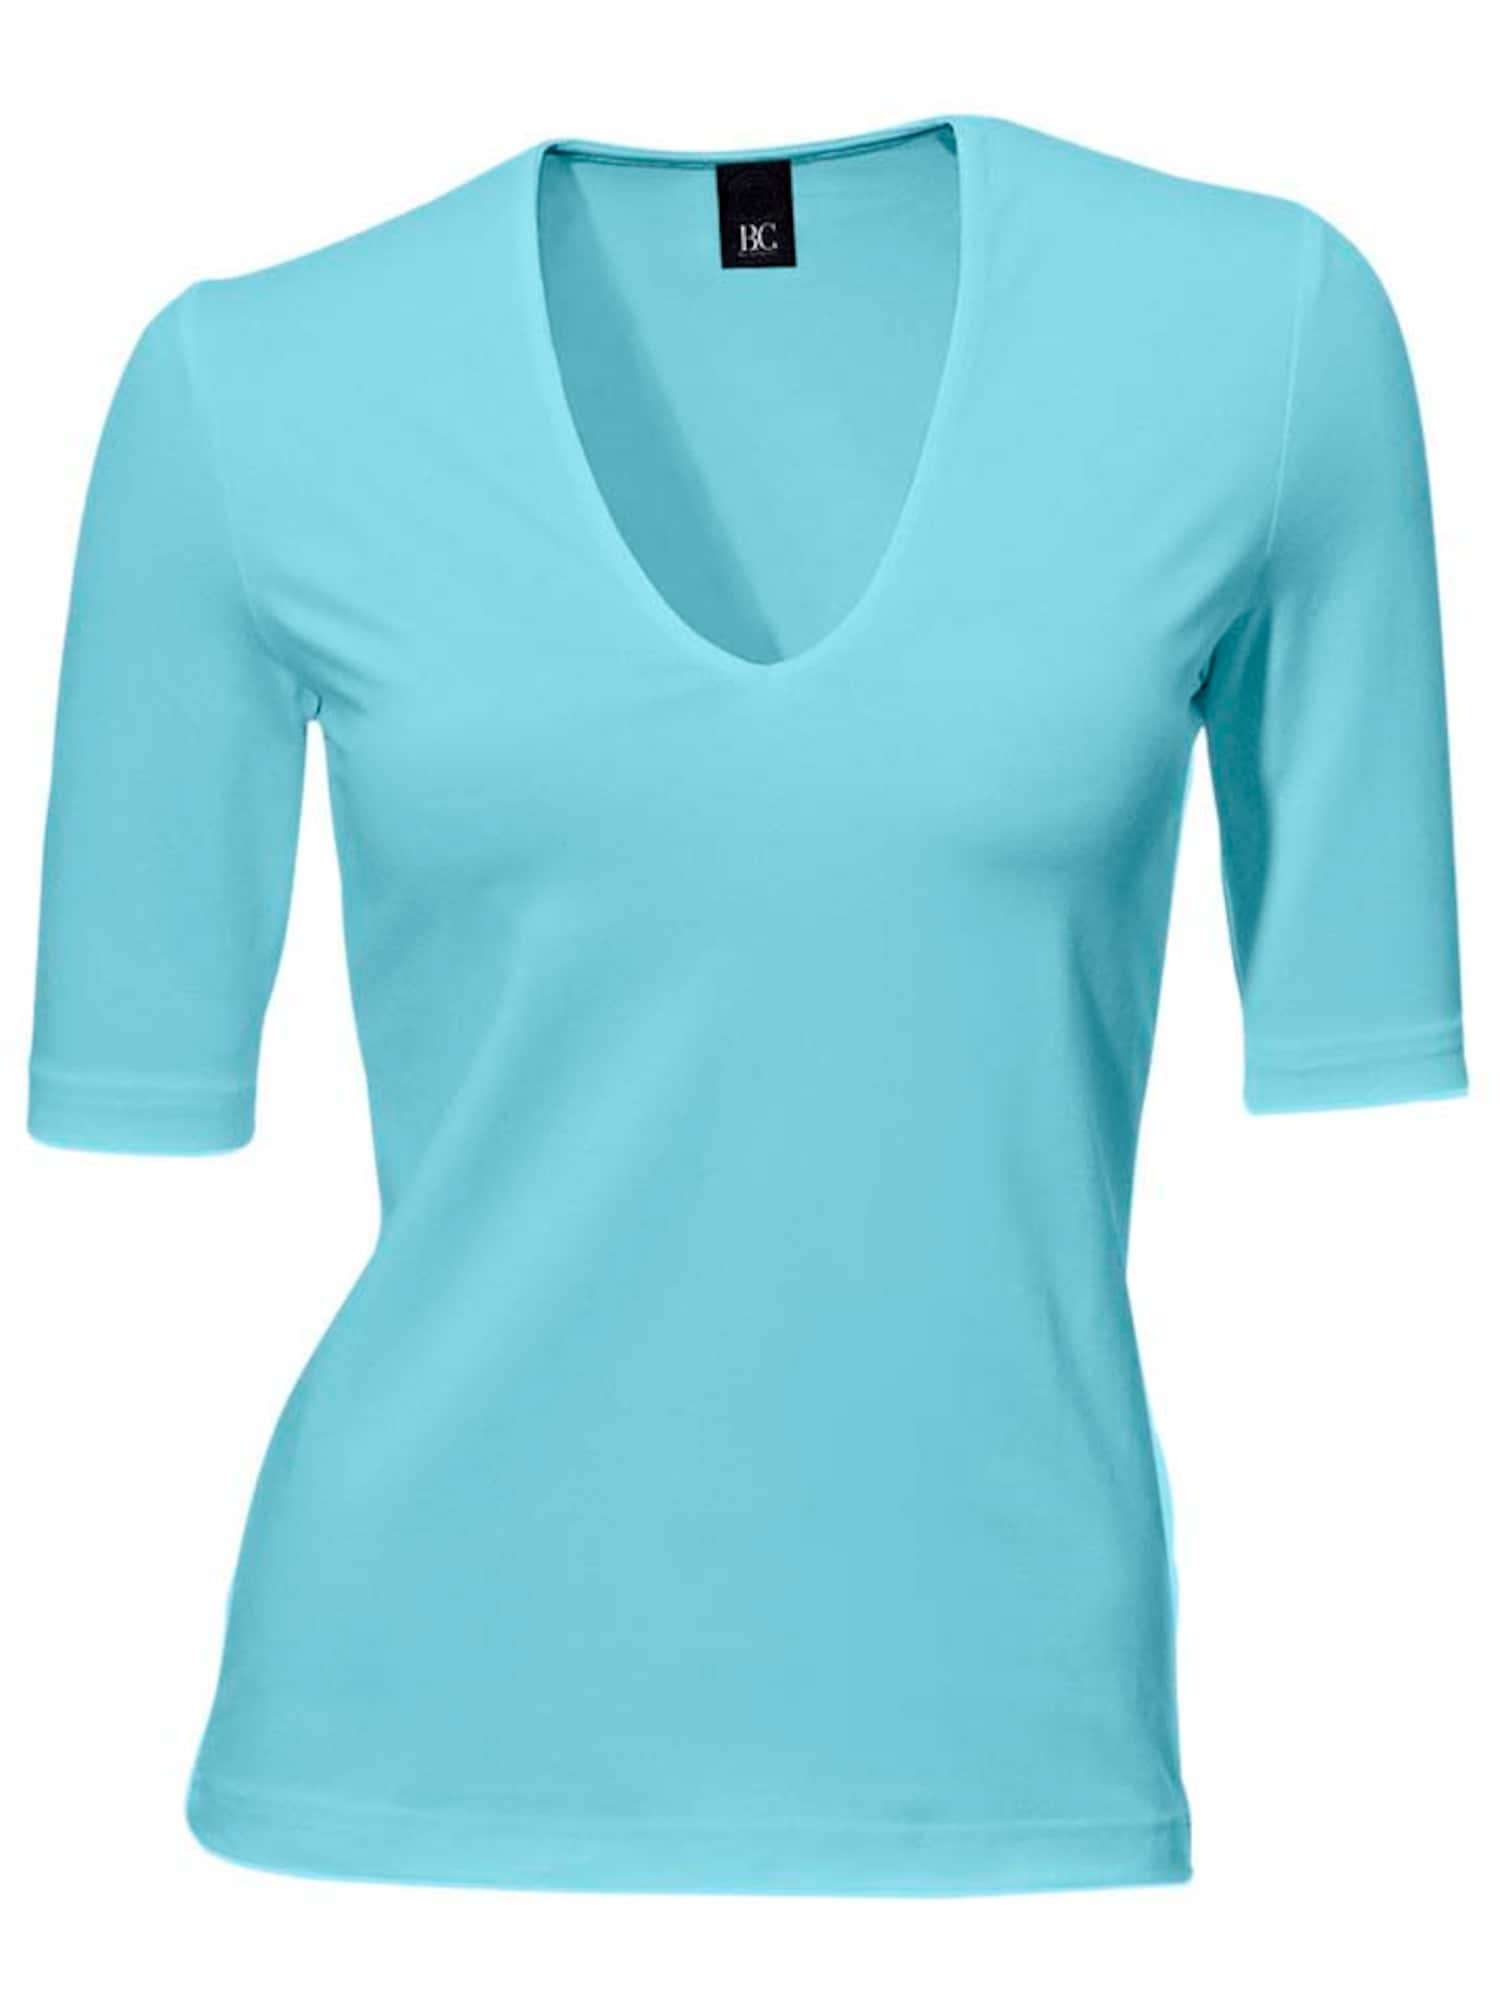 Ashley Brooke by heine Marškinėliai mėlyna